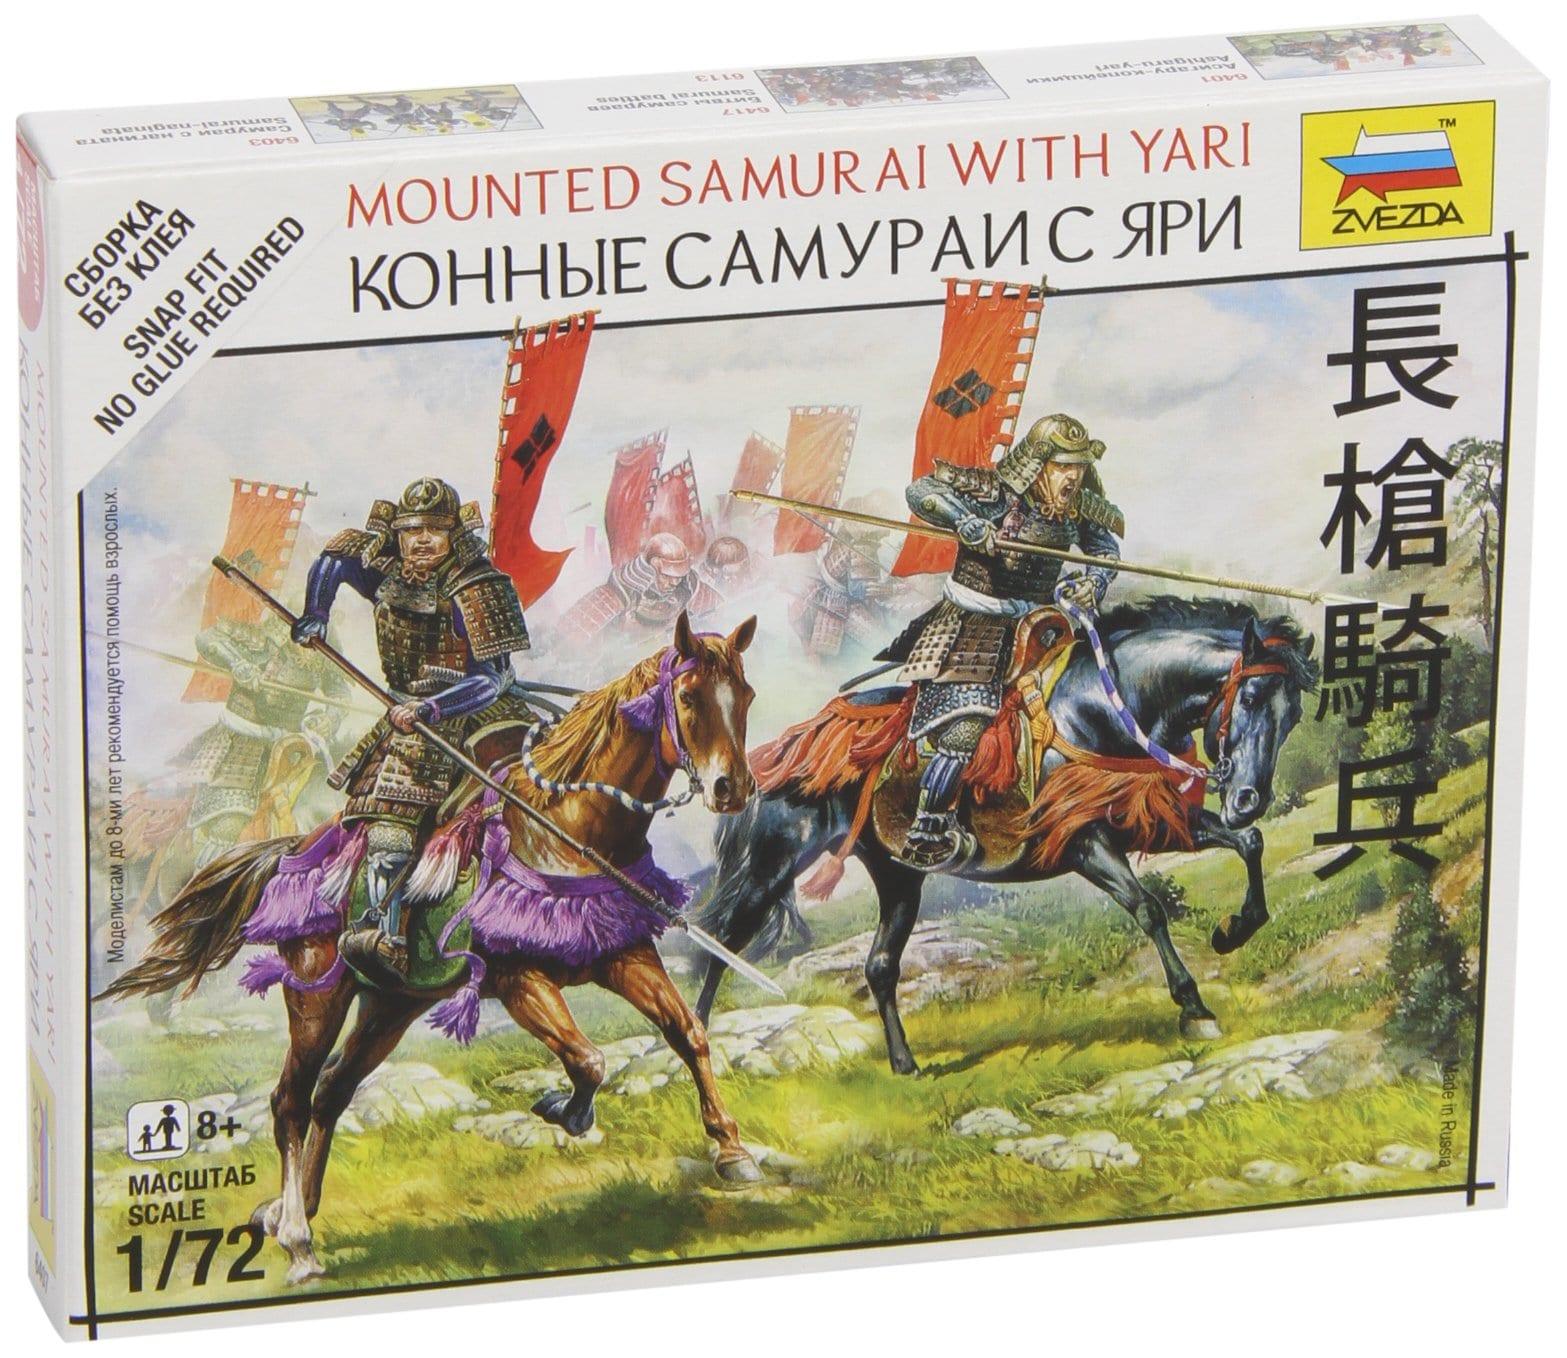 "Japan 15-17 cent/"" snap fit 1:72 Zvezda #2 Model Kits /""Warriors of Samurai Army"